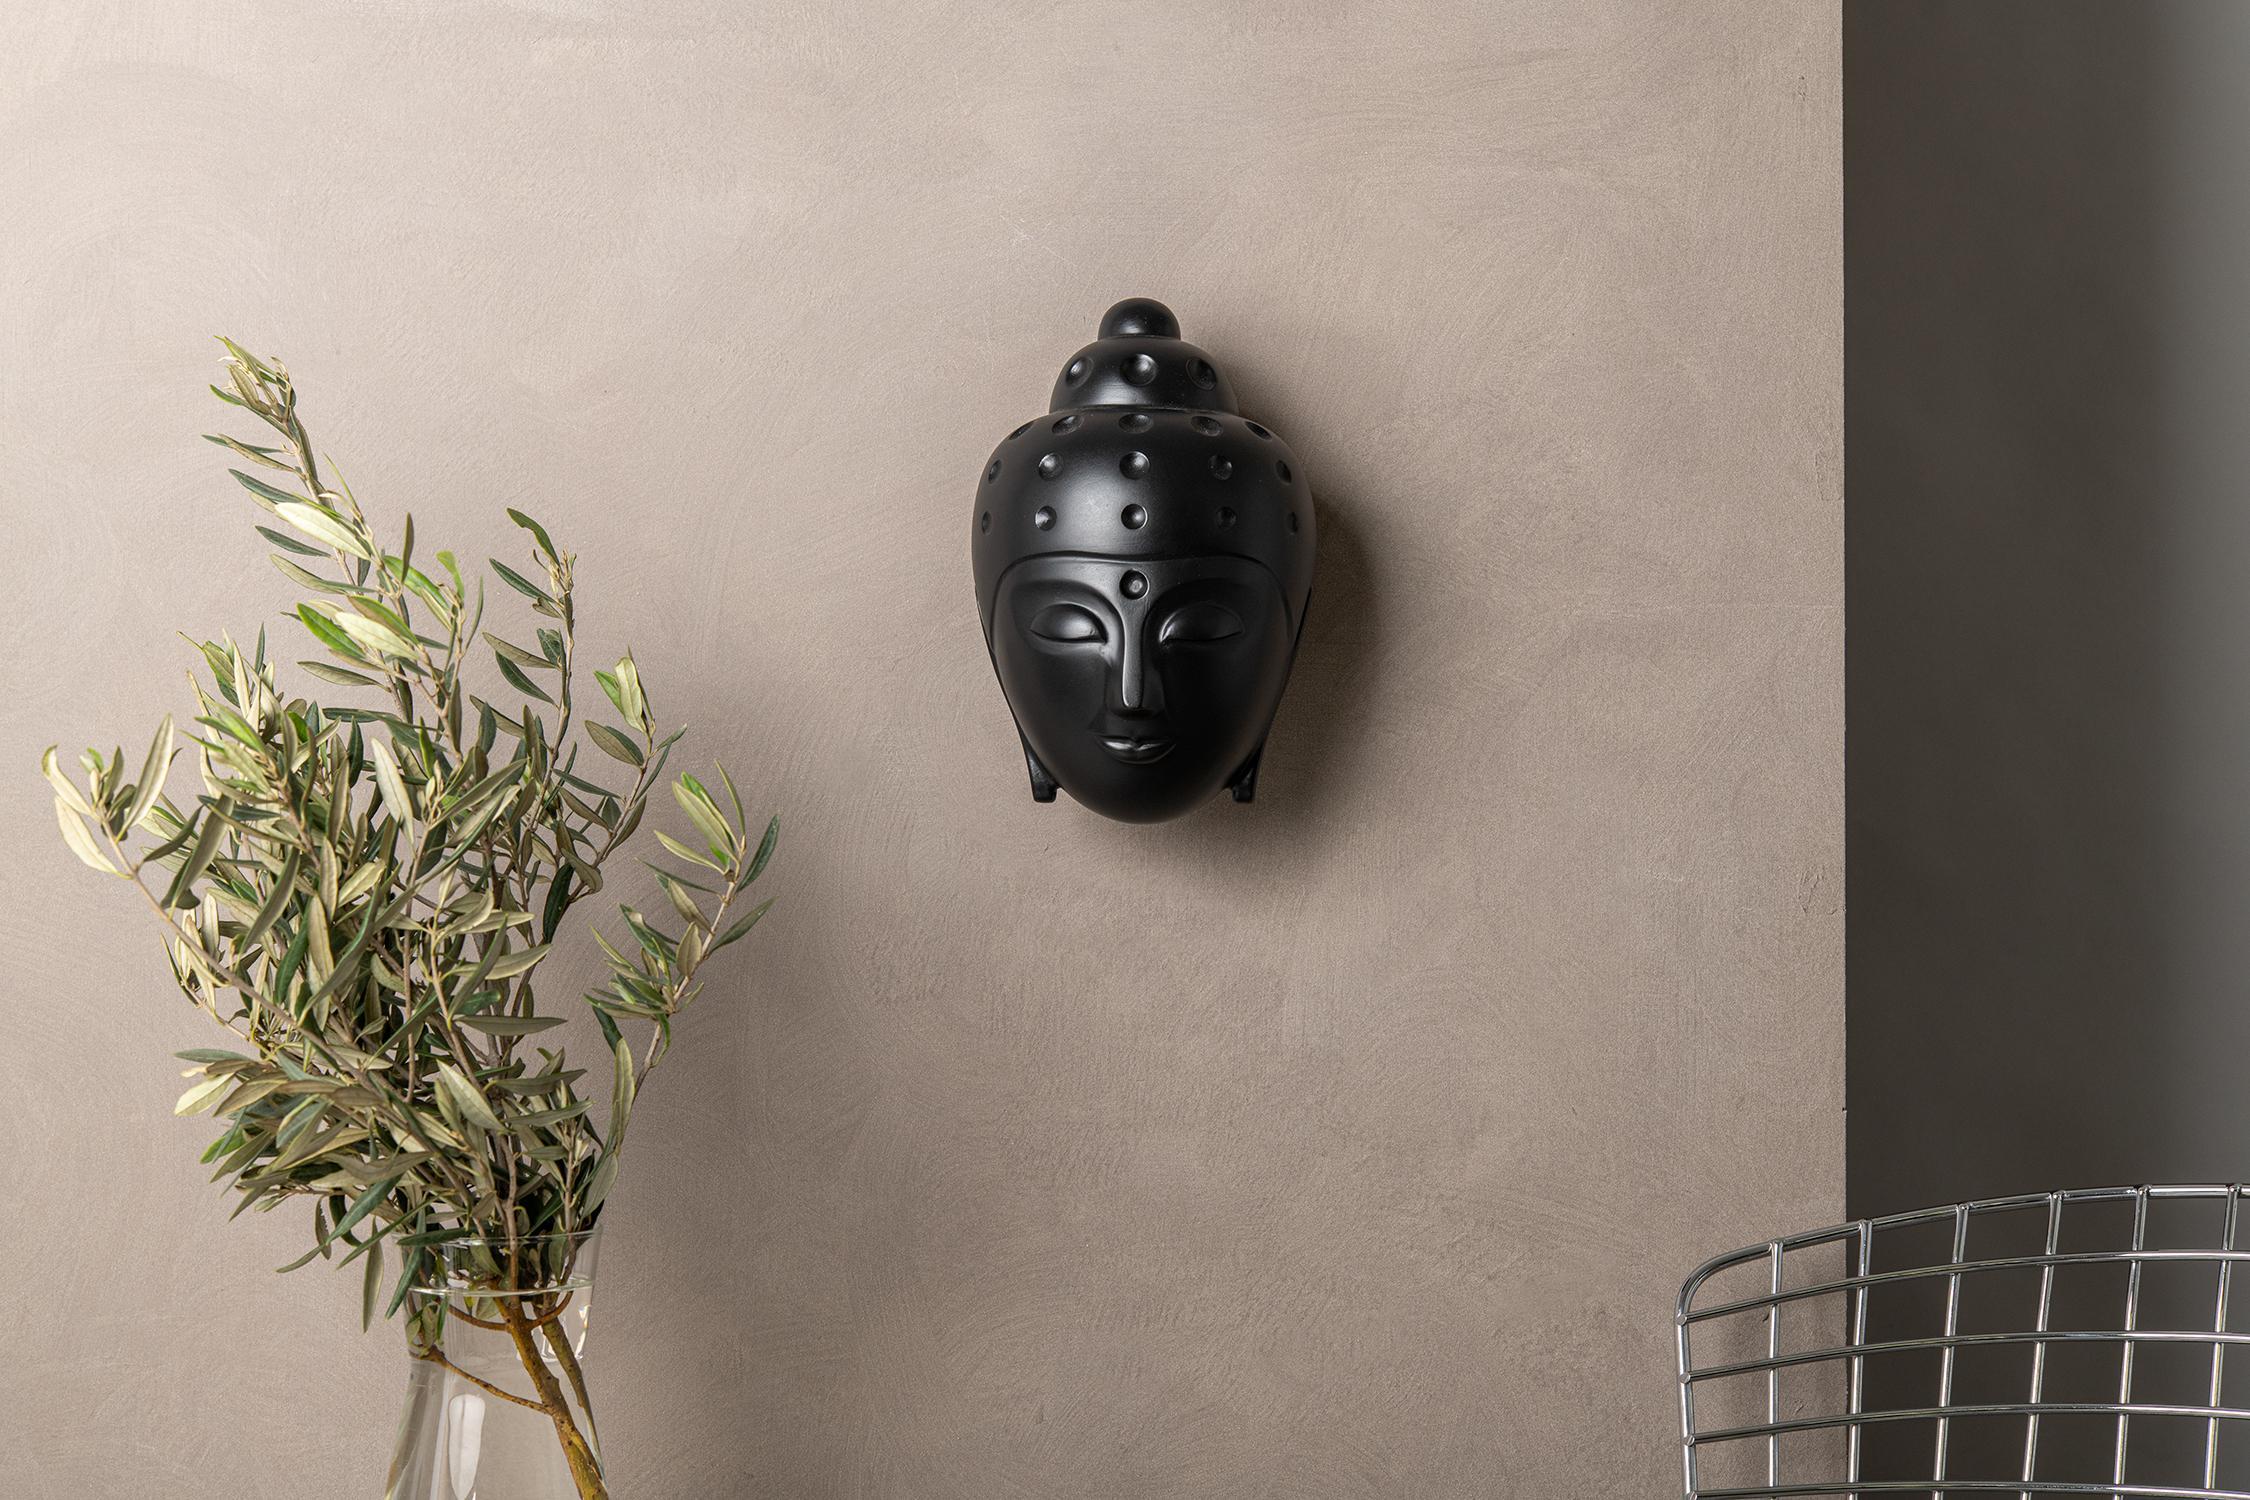 Floating Buddha head Statue - Black